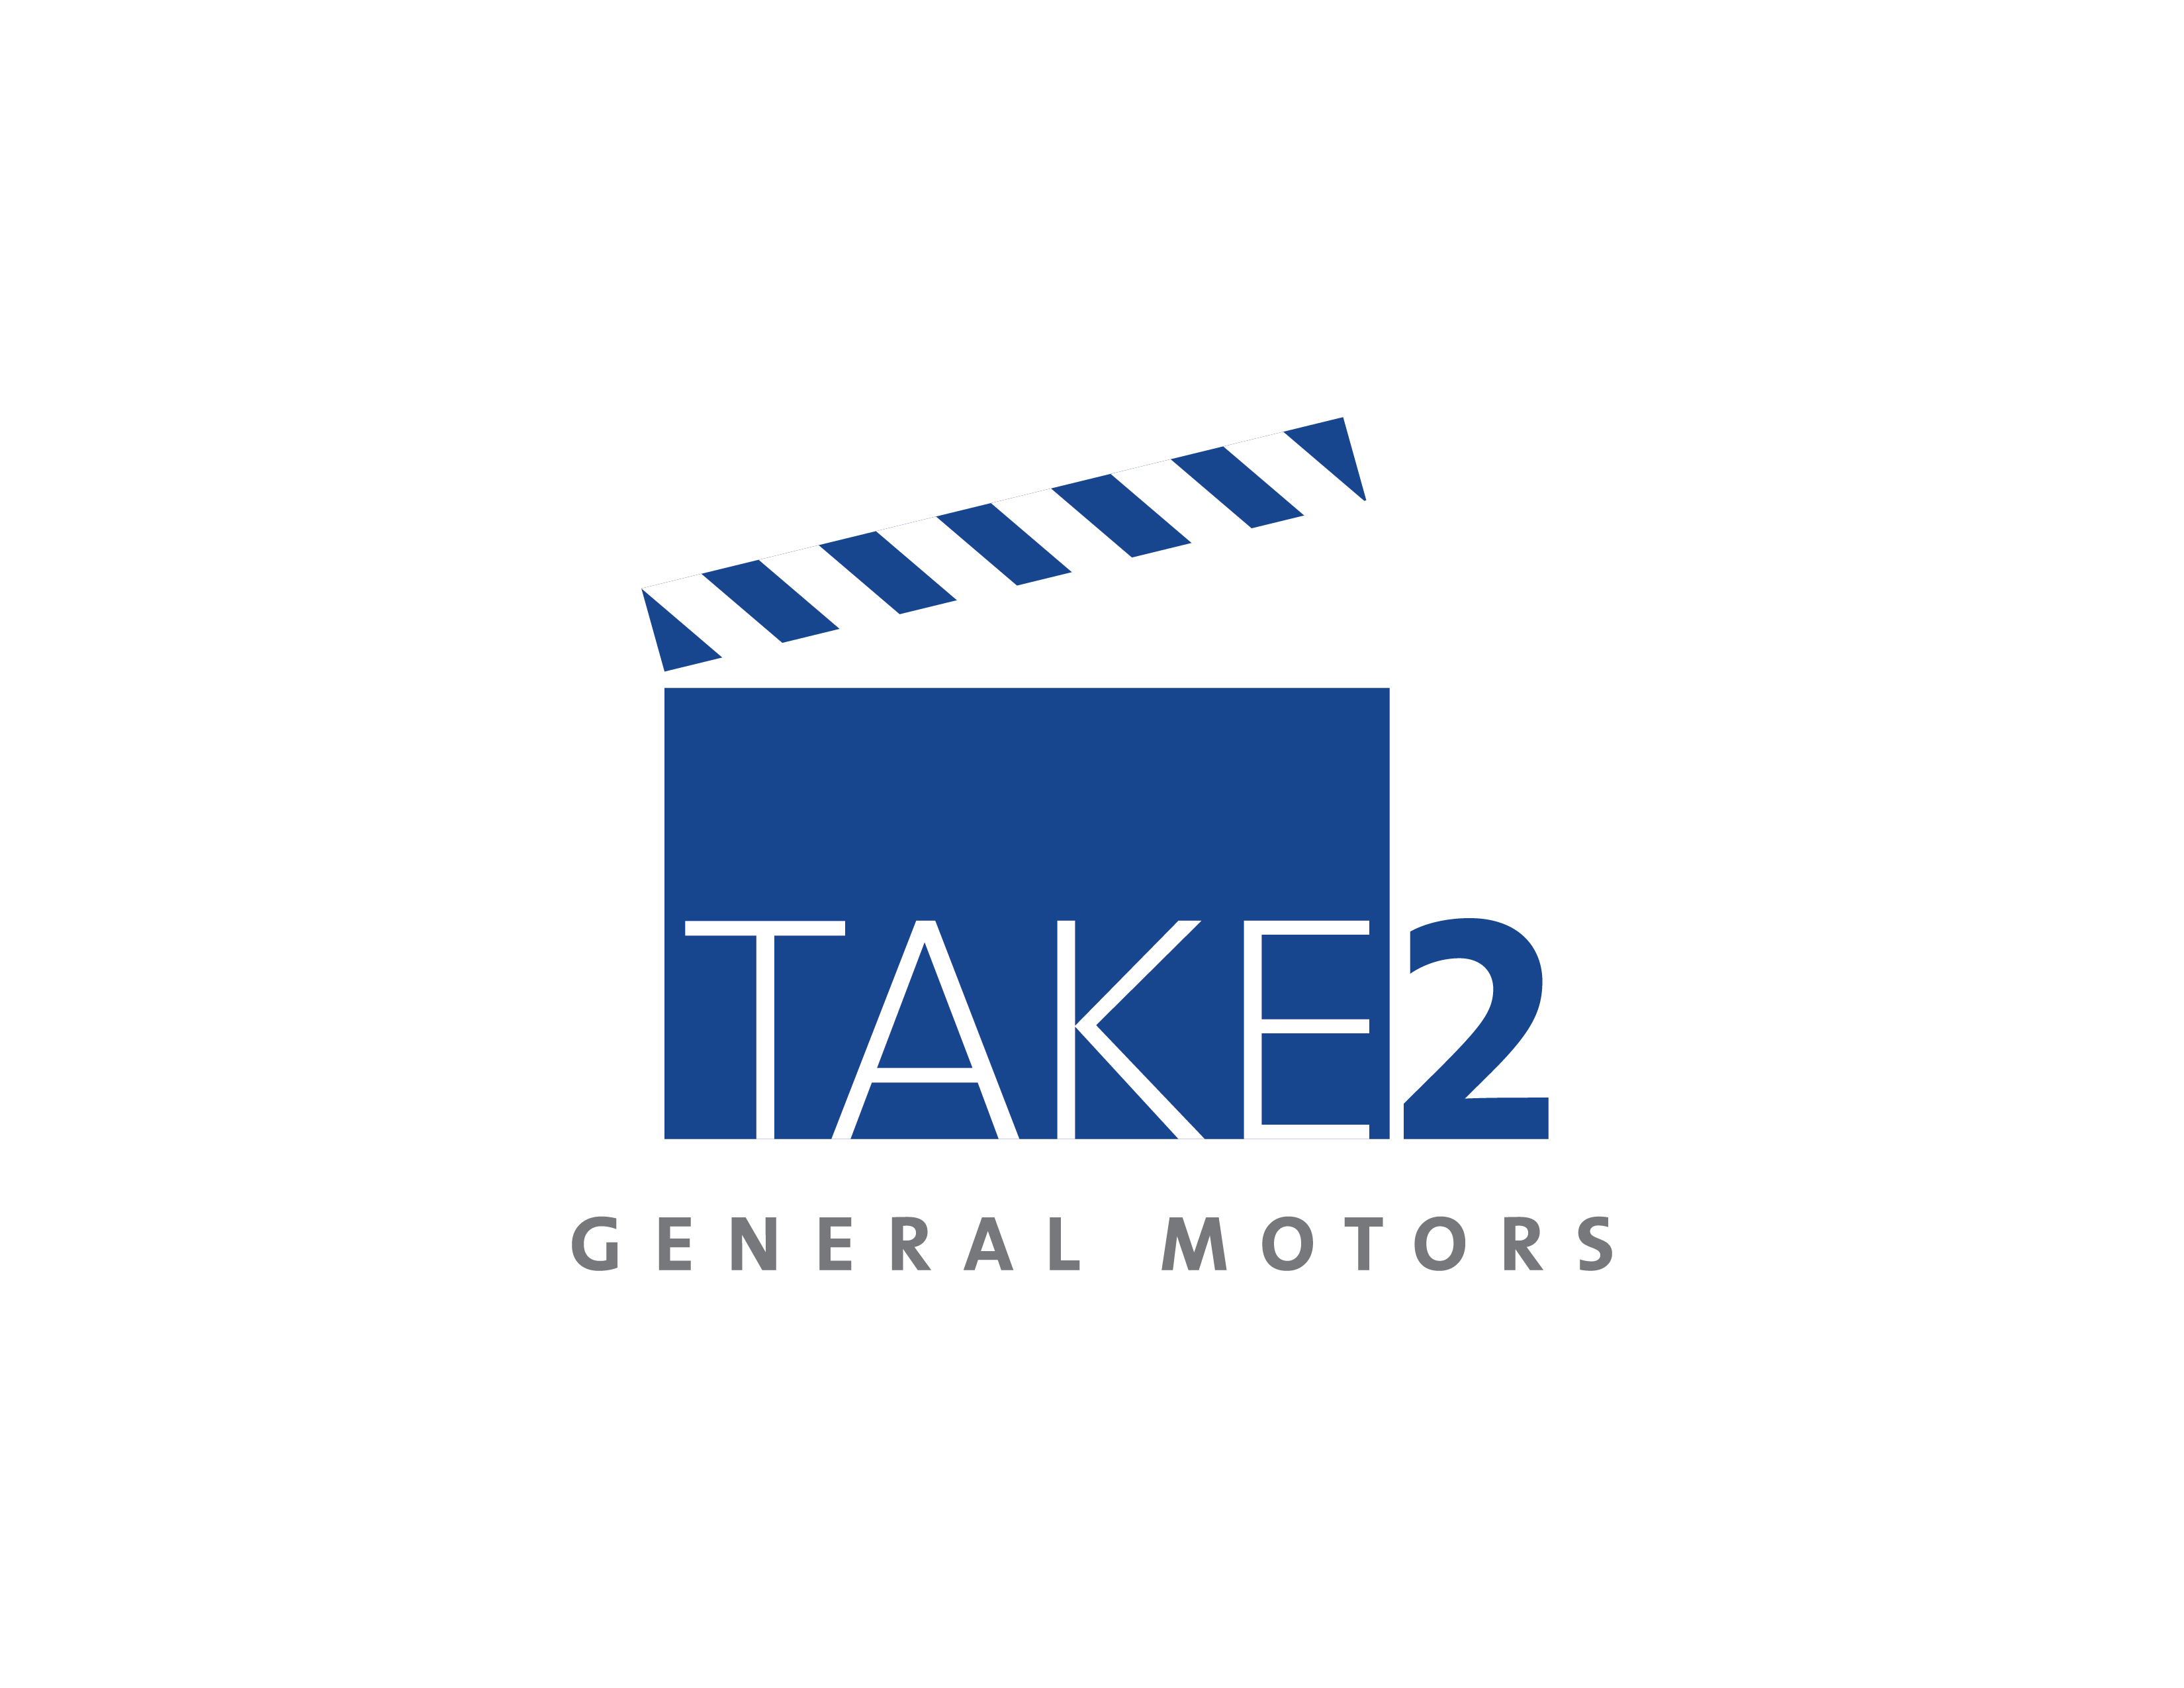 General Motors Expands Take 2 Program For Those Resuming